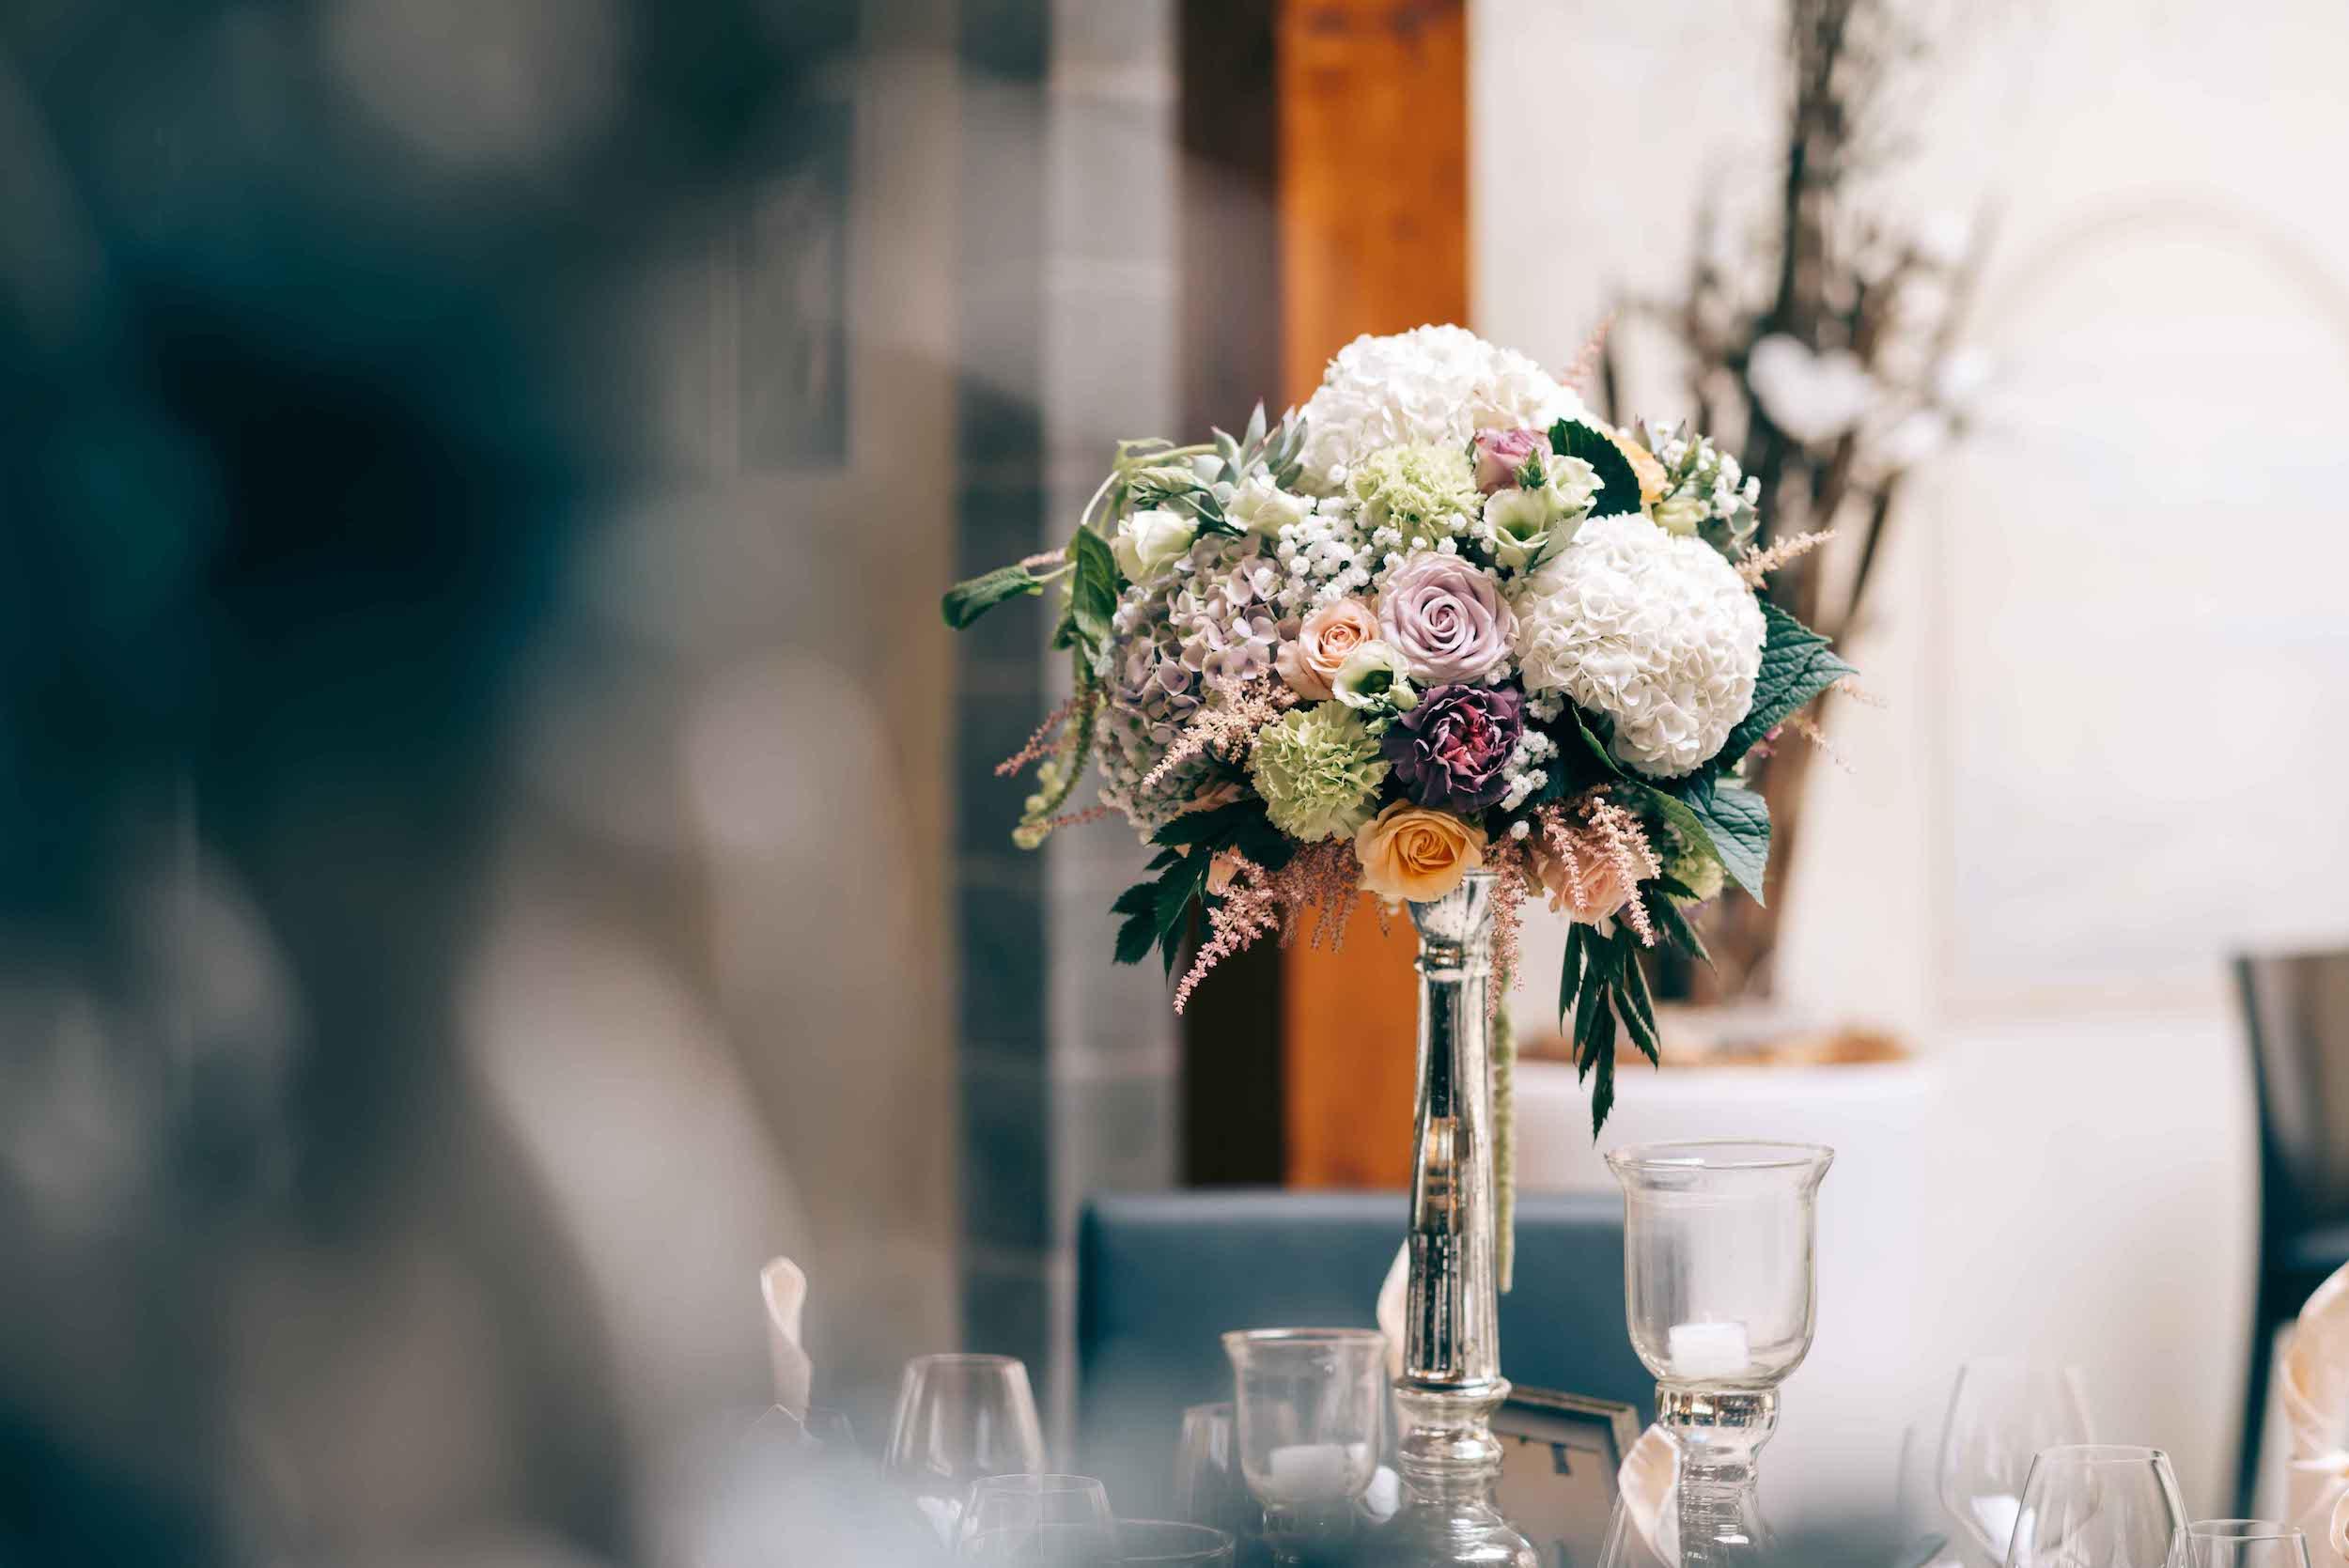 the-wedding-decorator-wedding-event-styling-sydney-northern-beaches.jpg